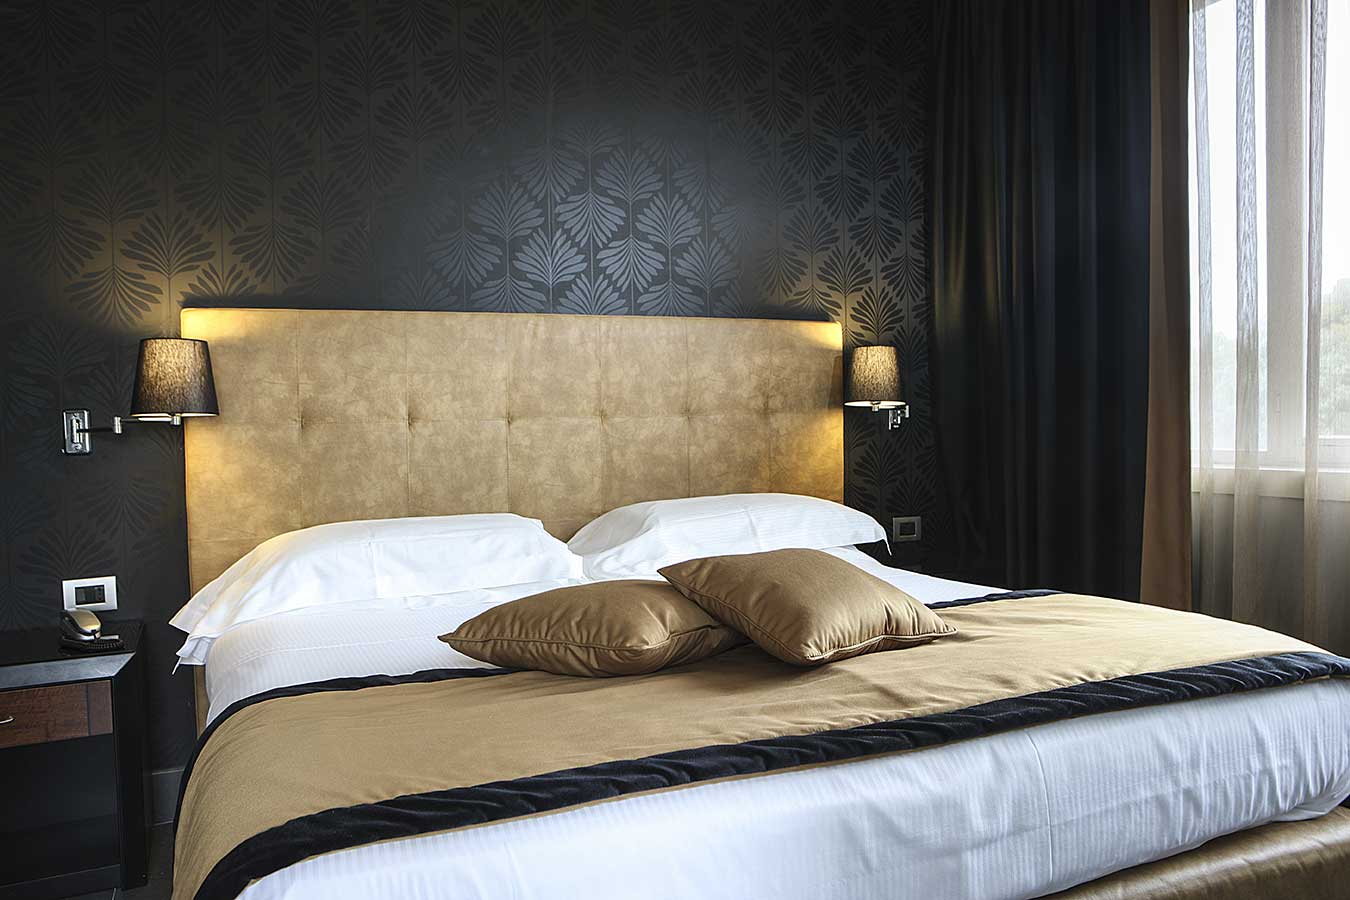 Napoli - Best Western JFK Hotel